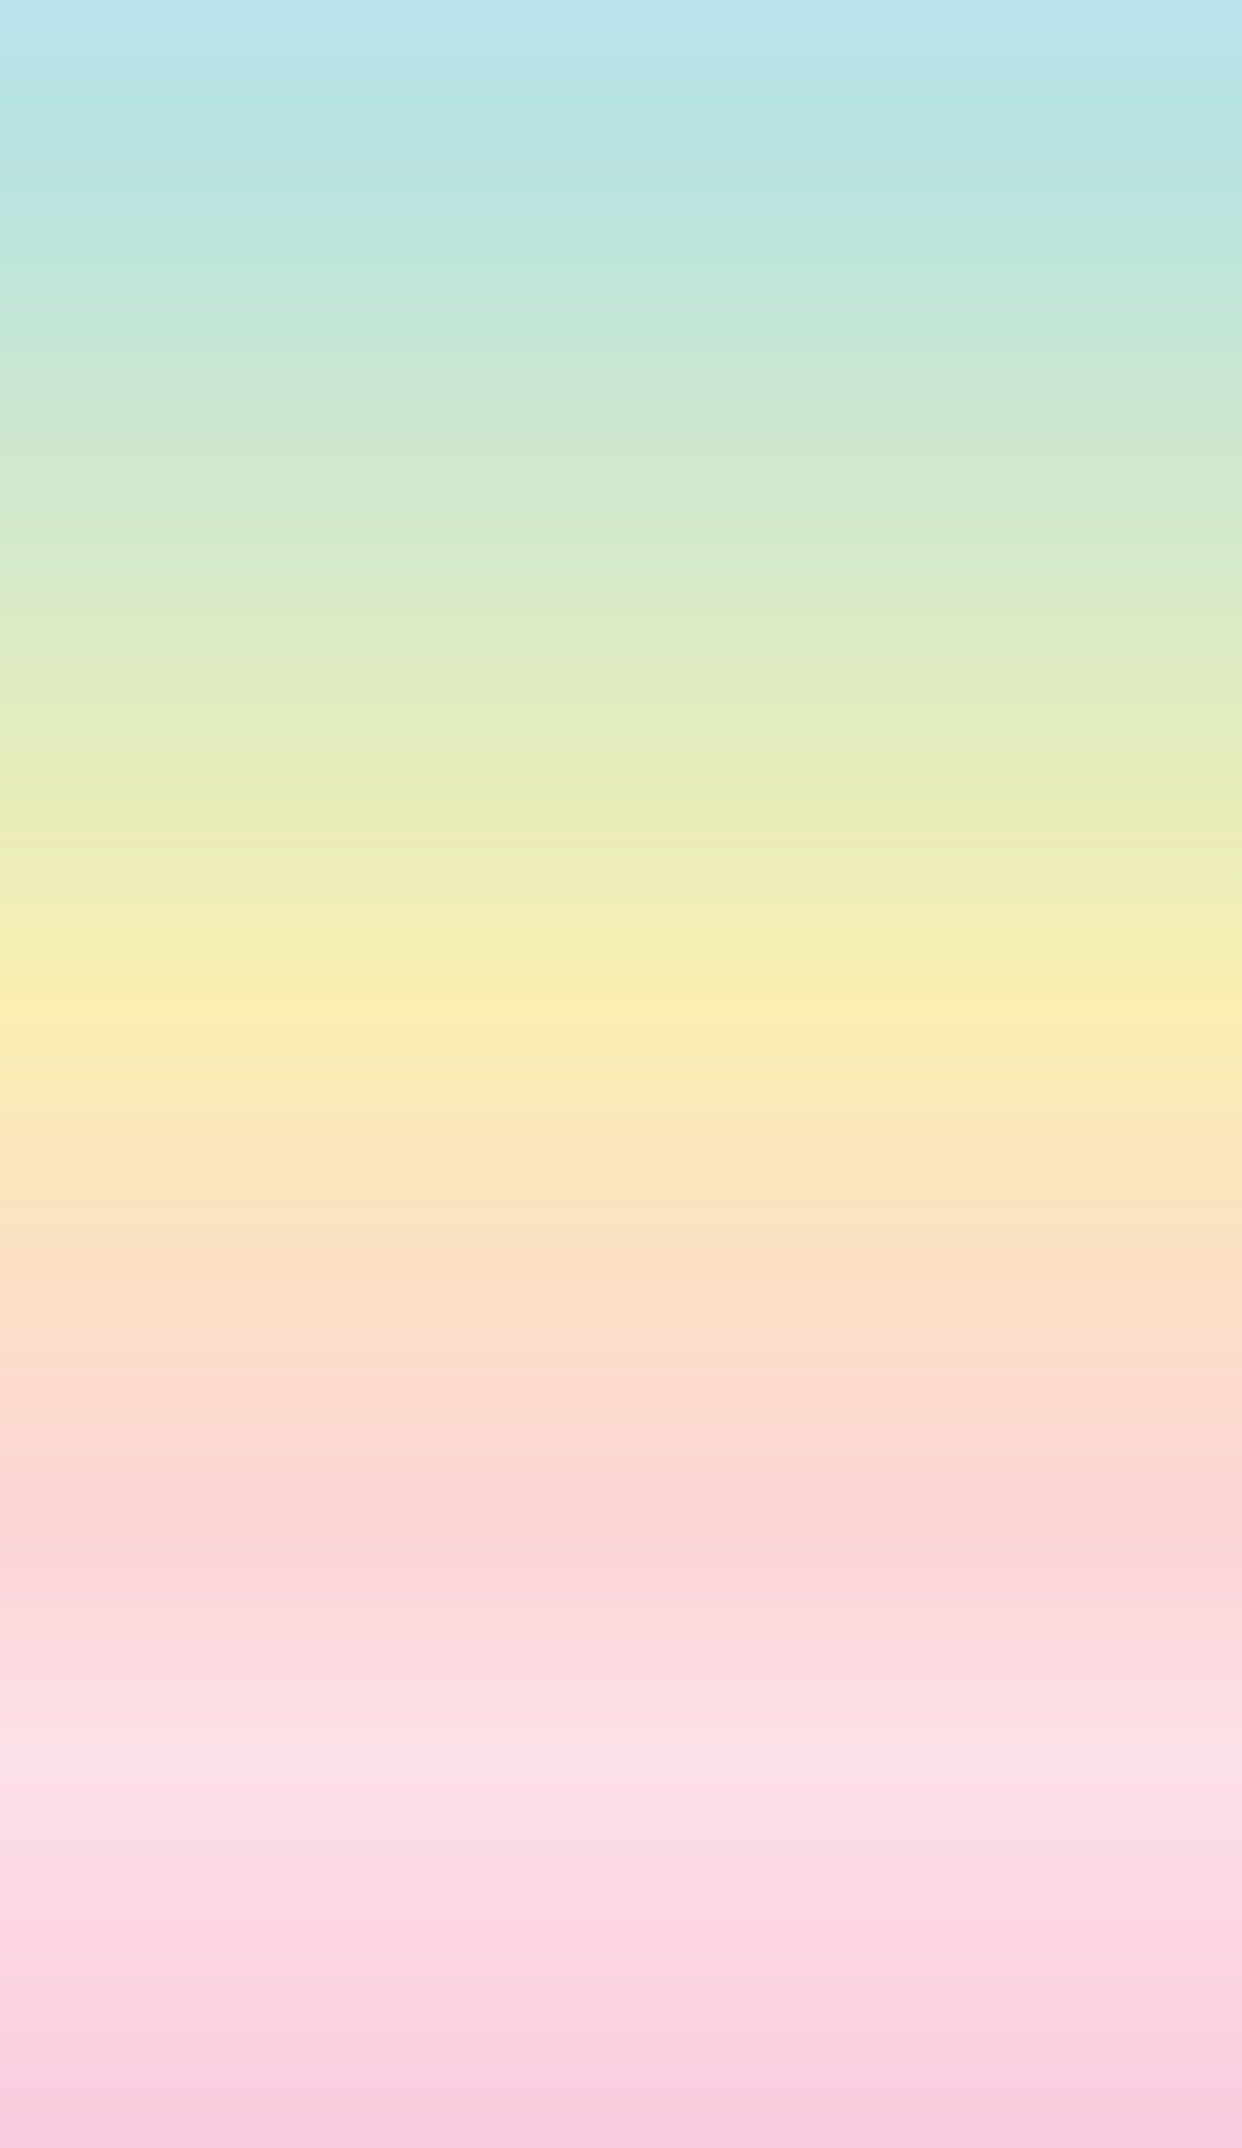 SpringOmbre-iphone6plus.jpg (1242×2148) | Wallpaper | Pinterest ...